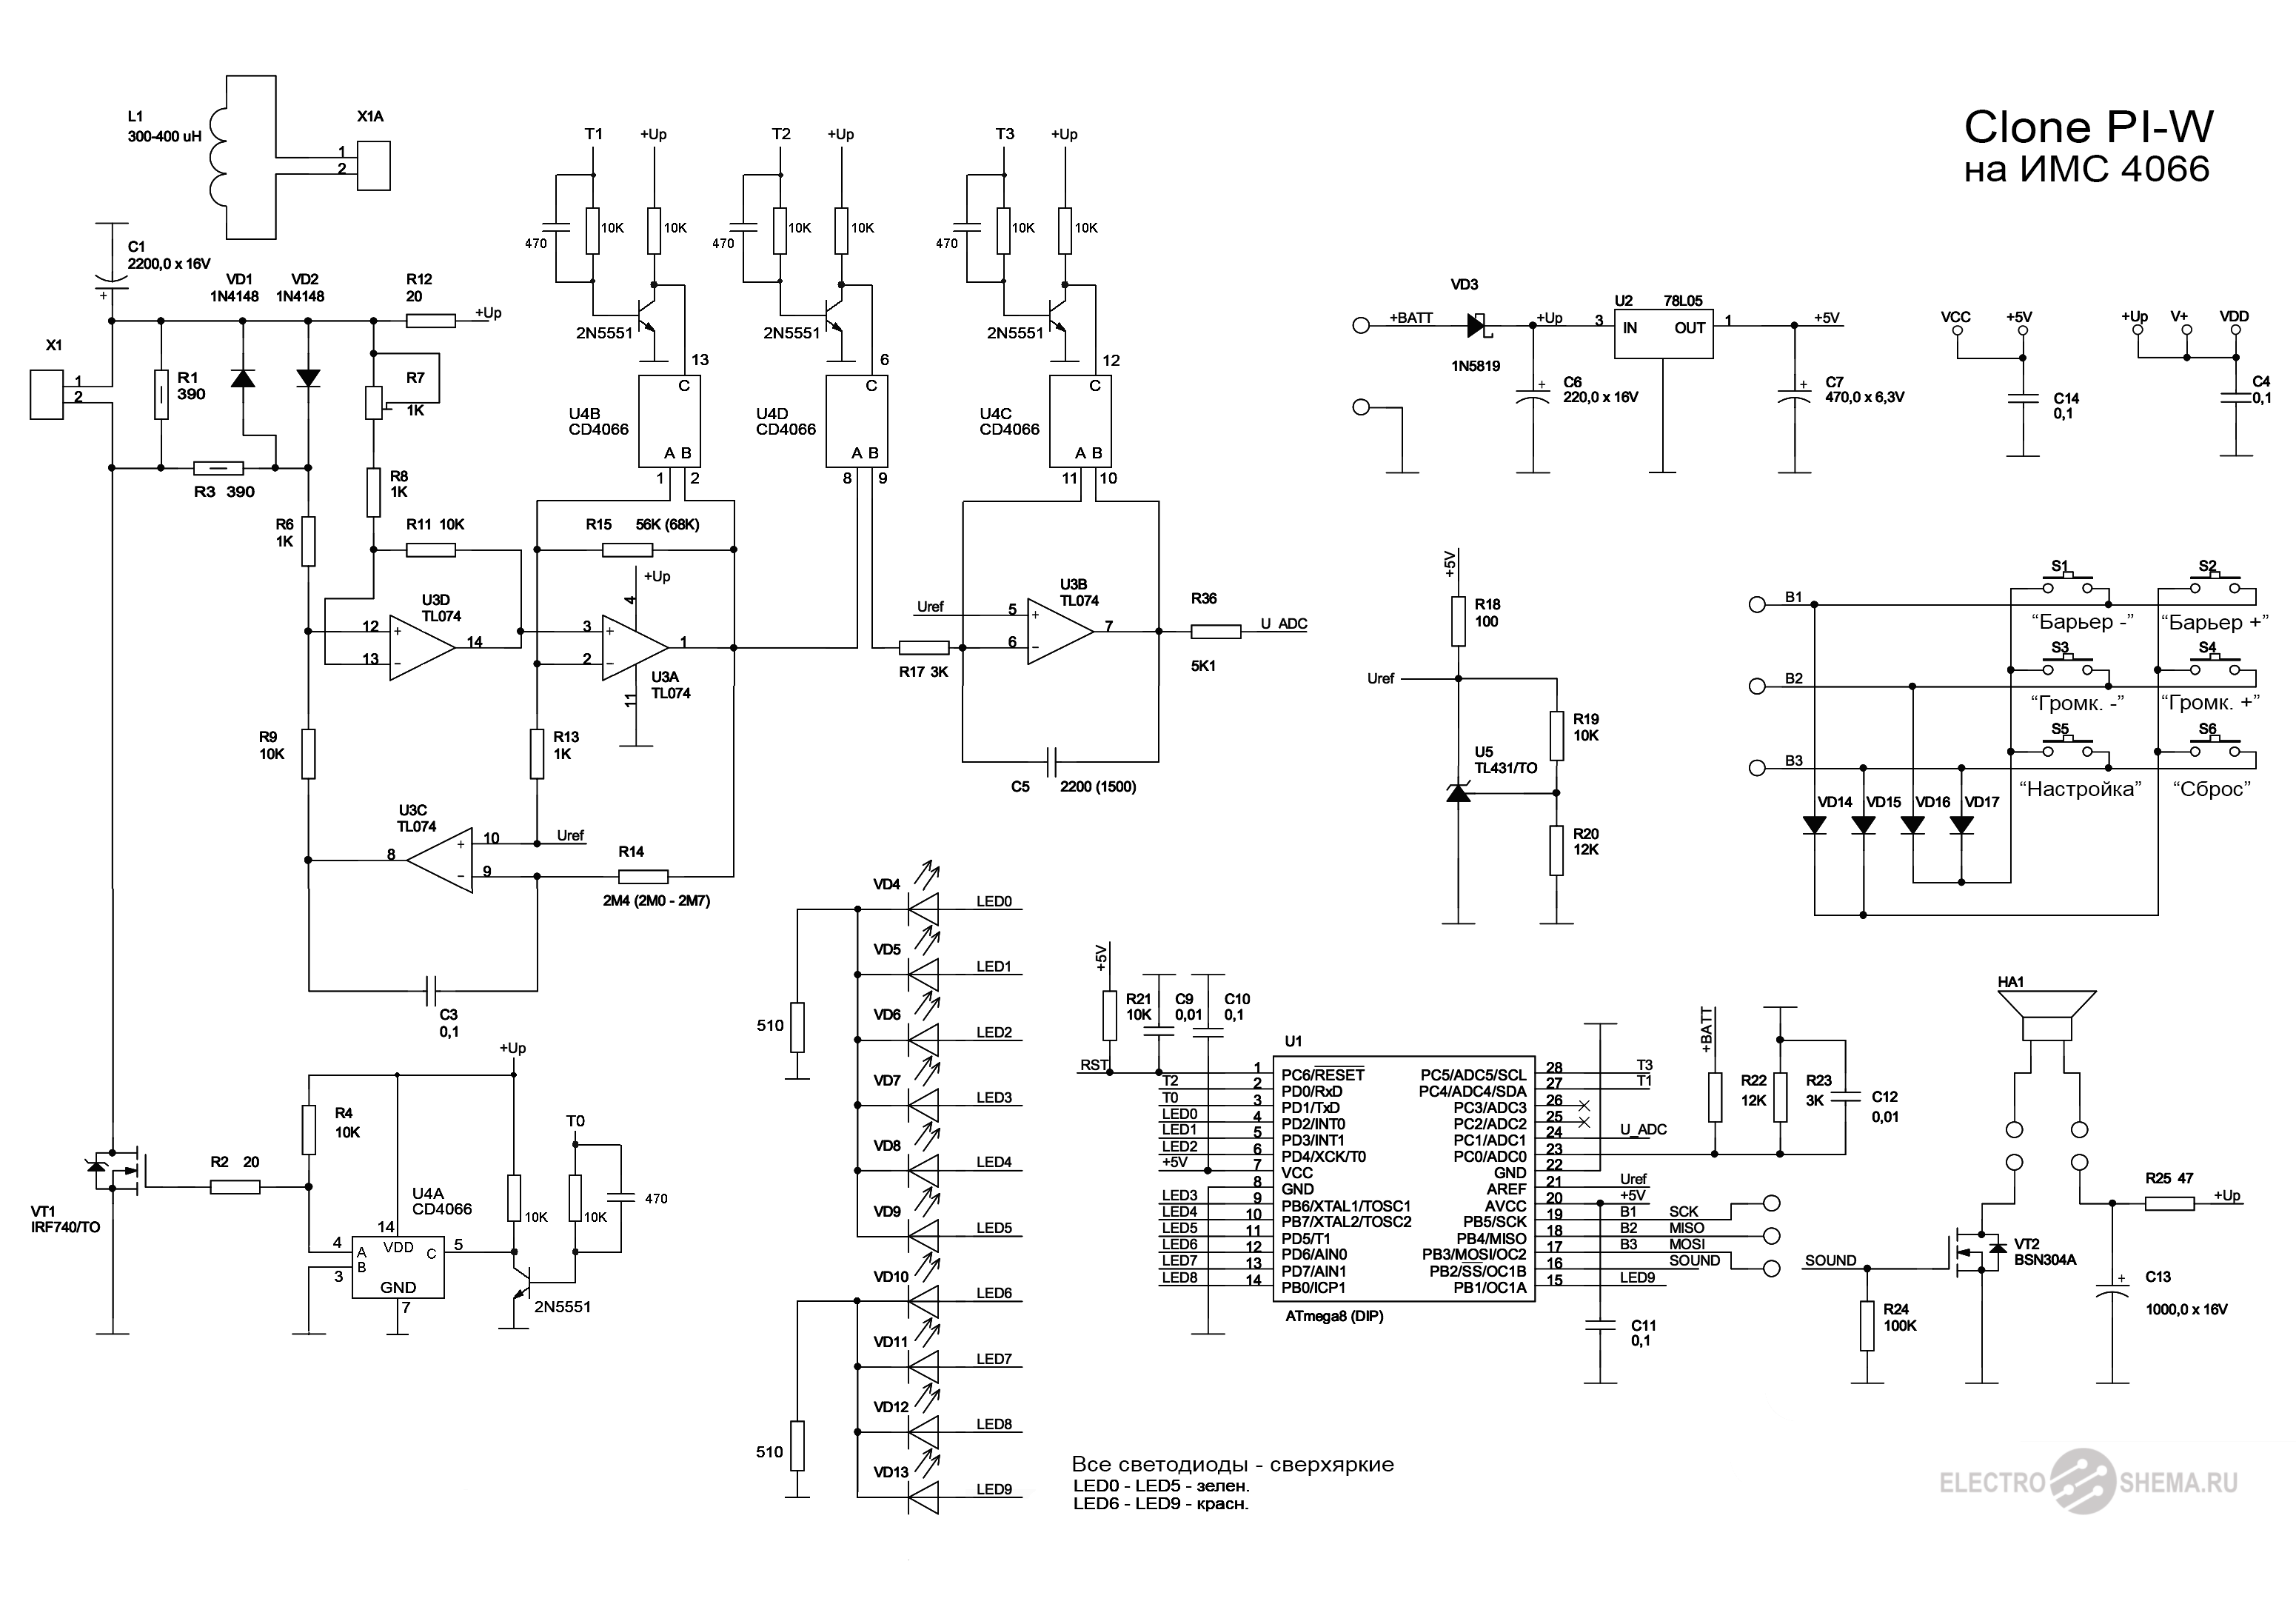 Схема Clone Pi-W на CD 4066